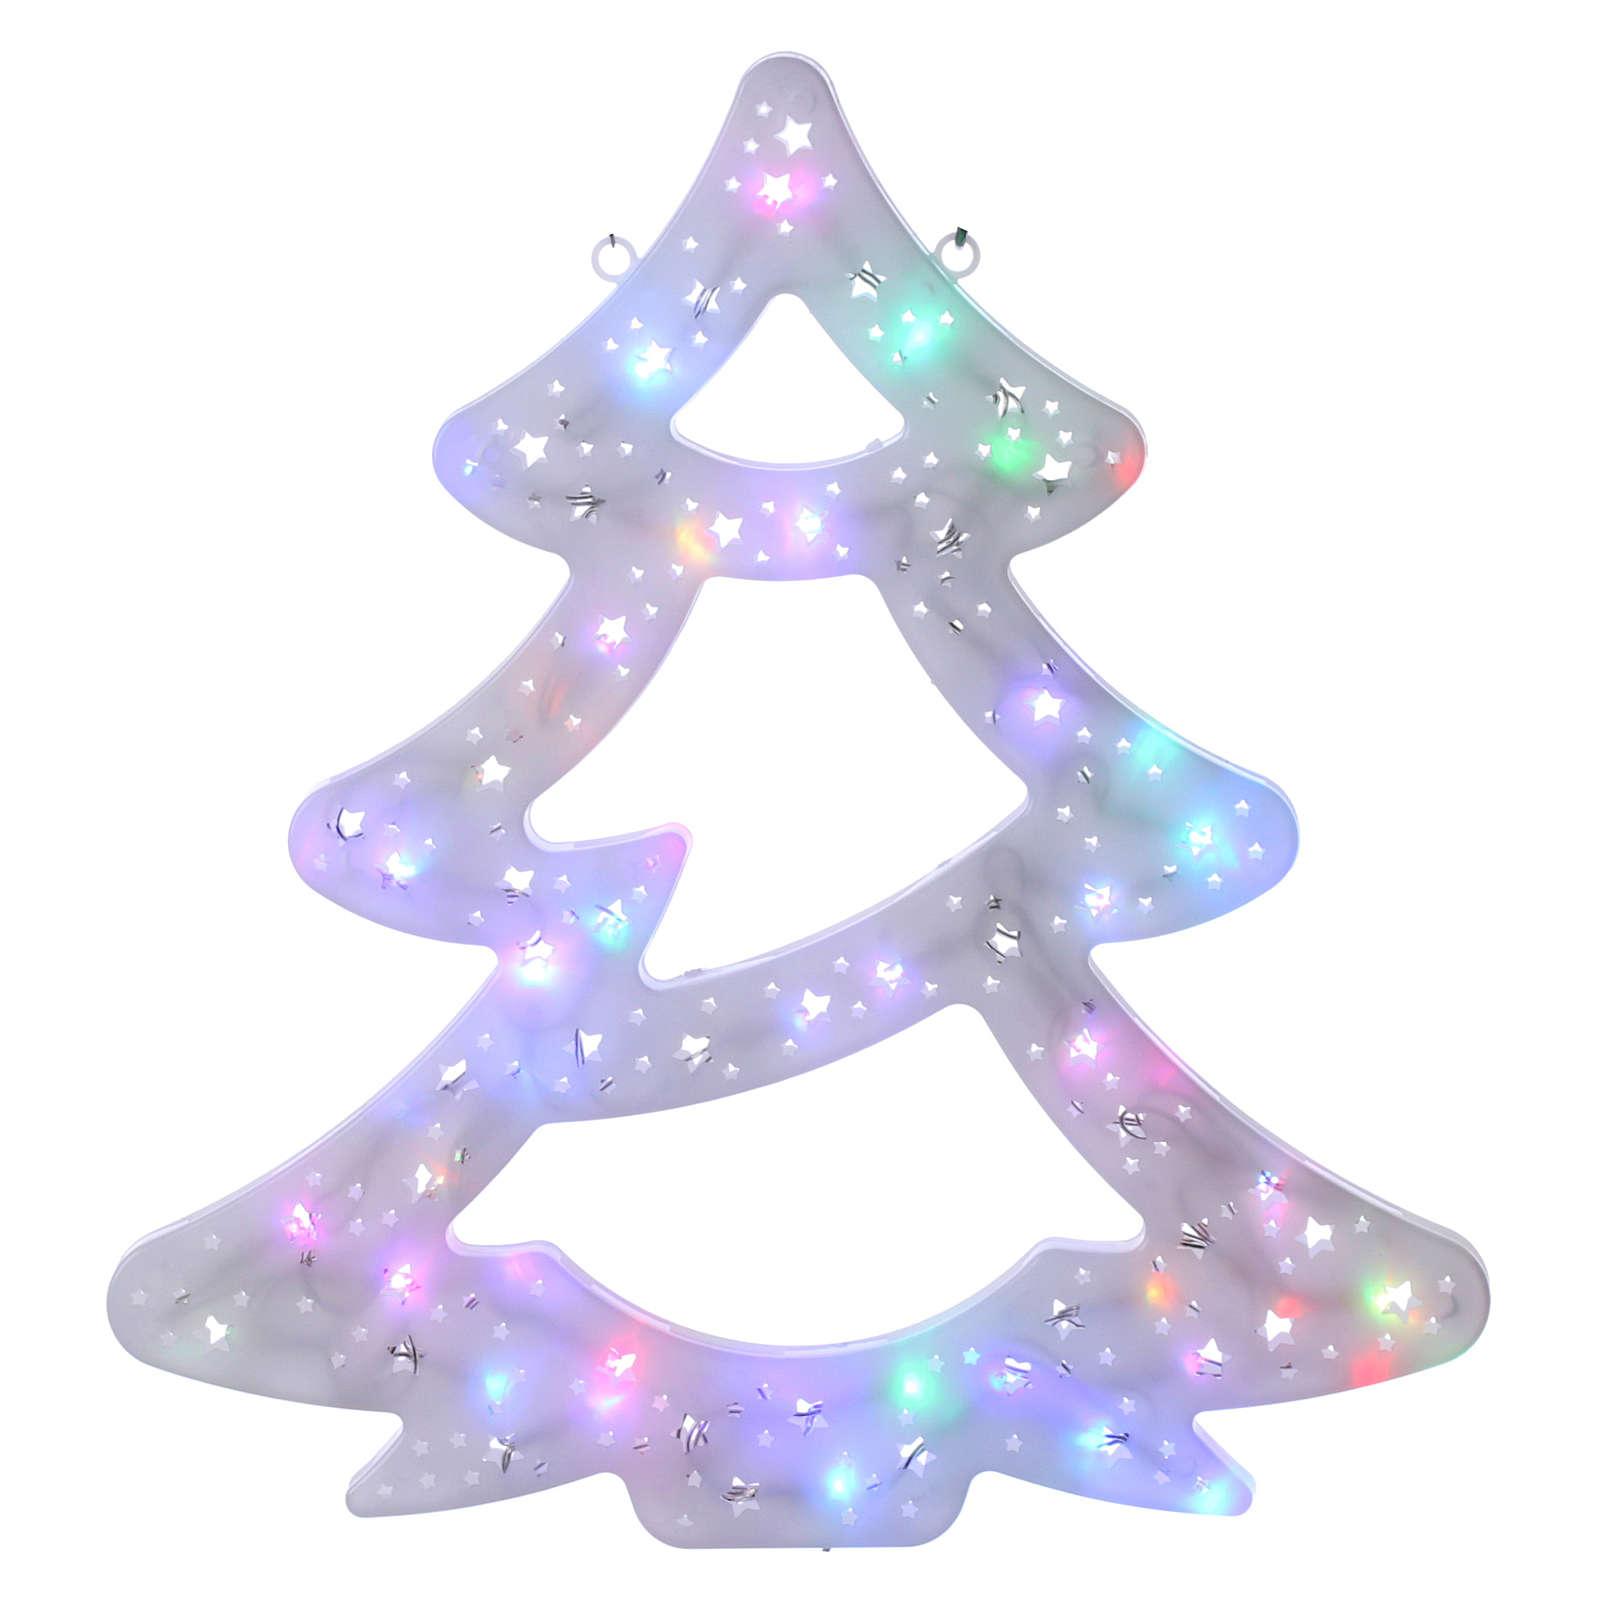 Christmas tree lights 50 coloured leds for internal and external use 3